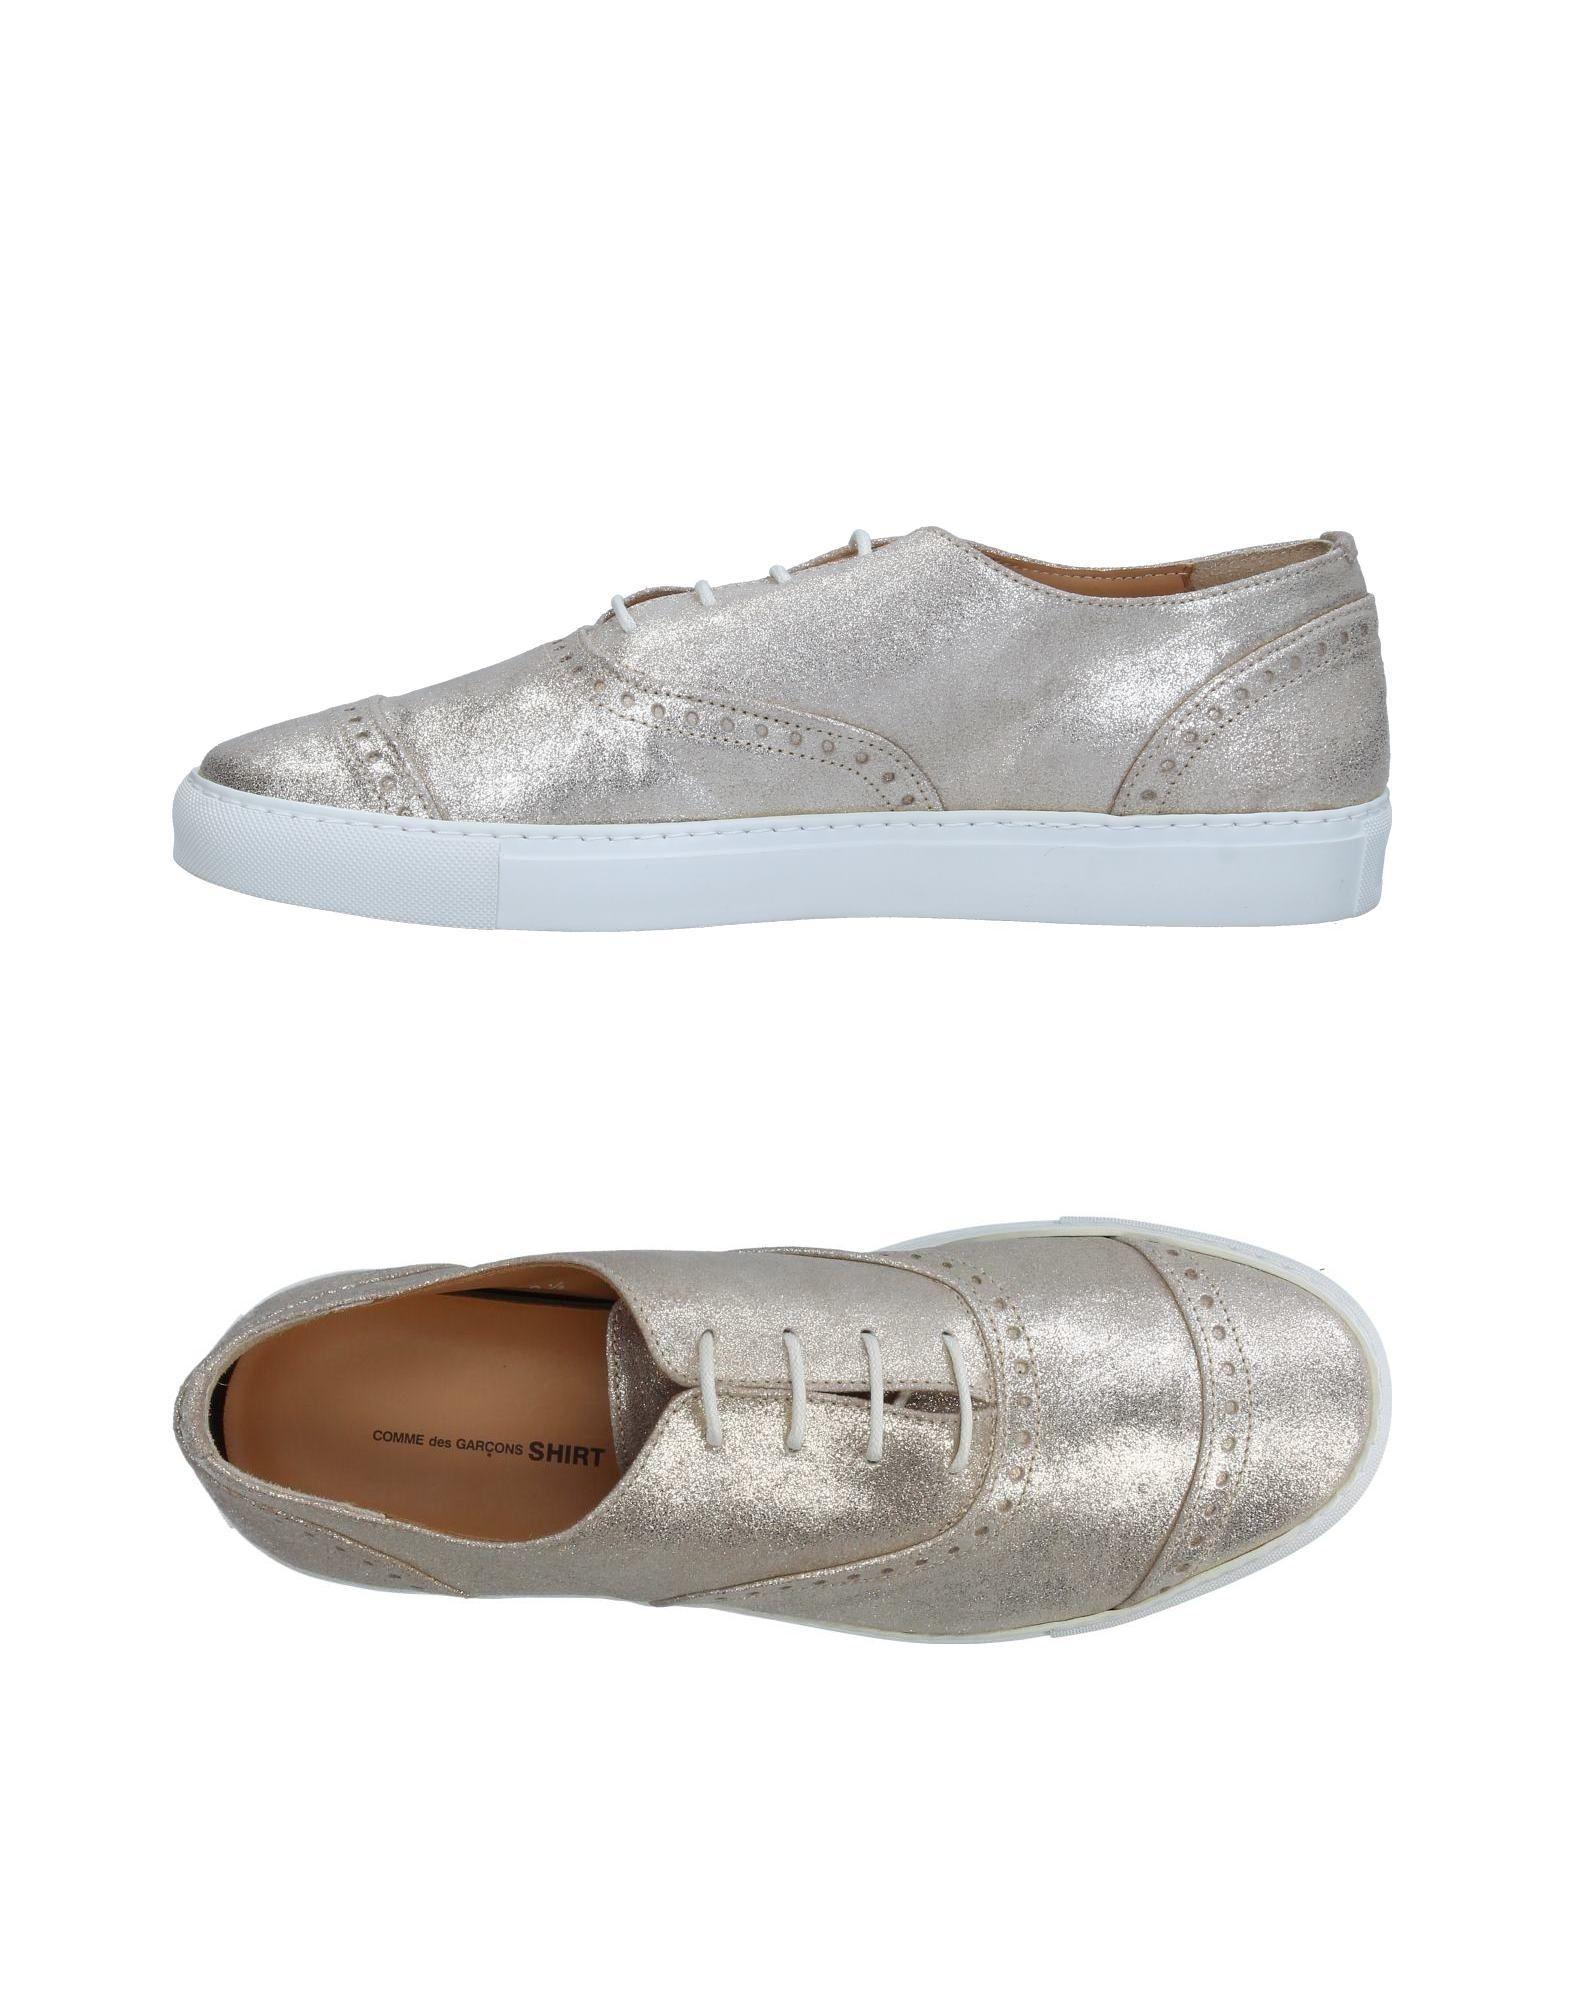 Sneakers Comme Des Garçons Shirt Uomo - Acquista online su